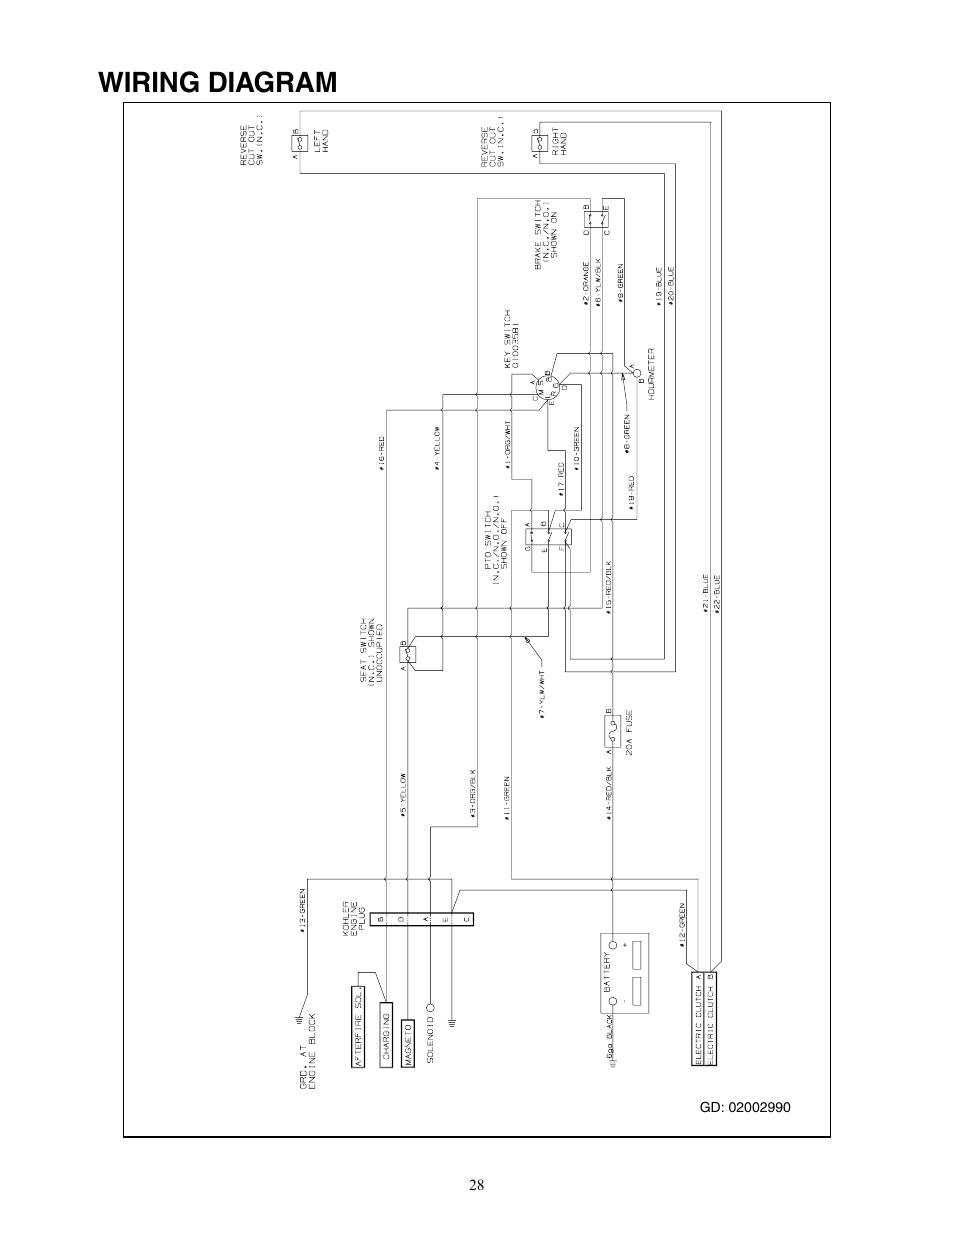 medium resolution of wiring diagram cub cadet 23hp z force 50 user manual page 28 32